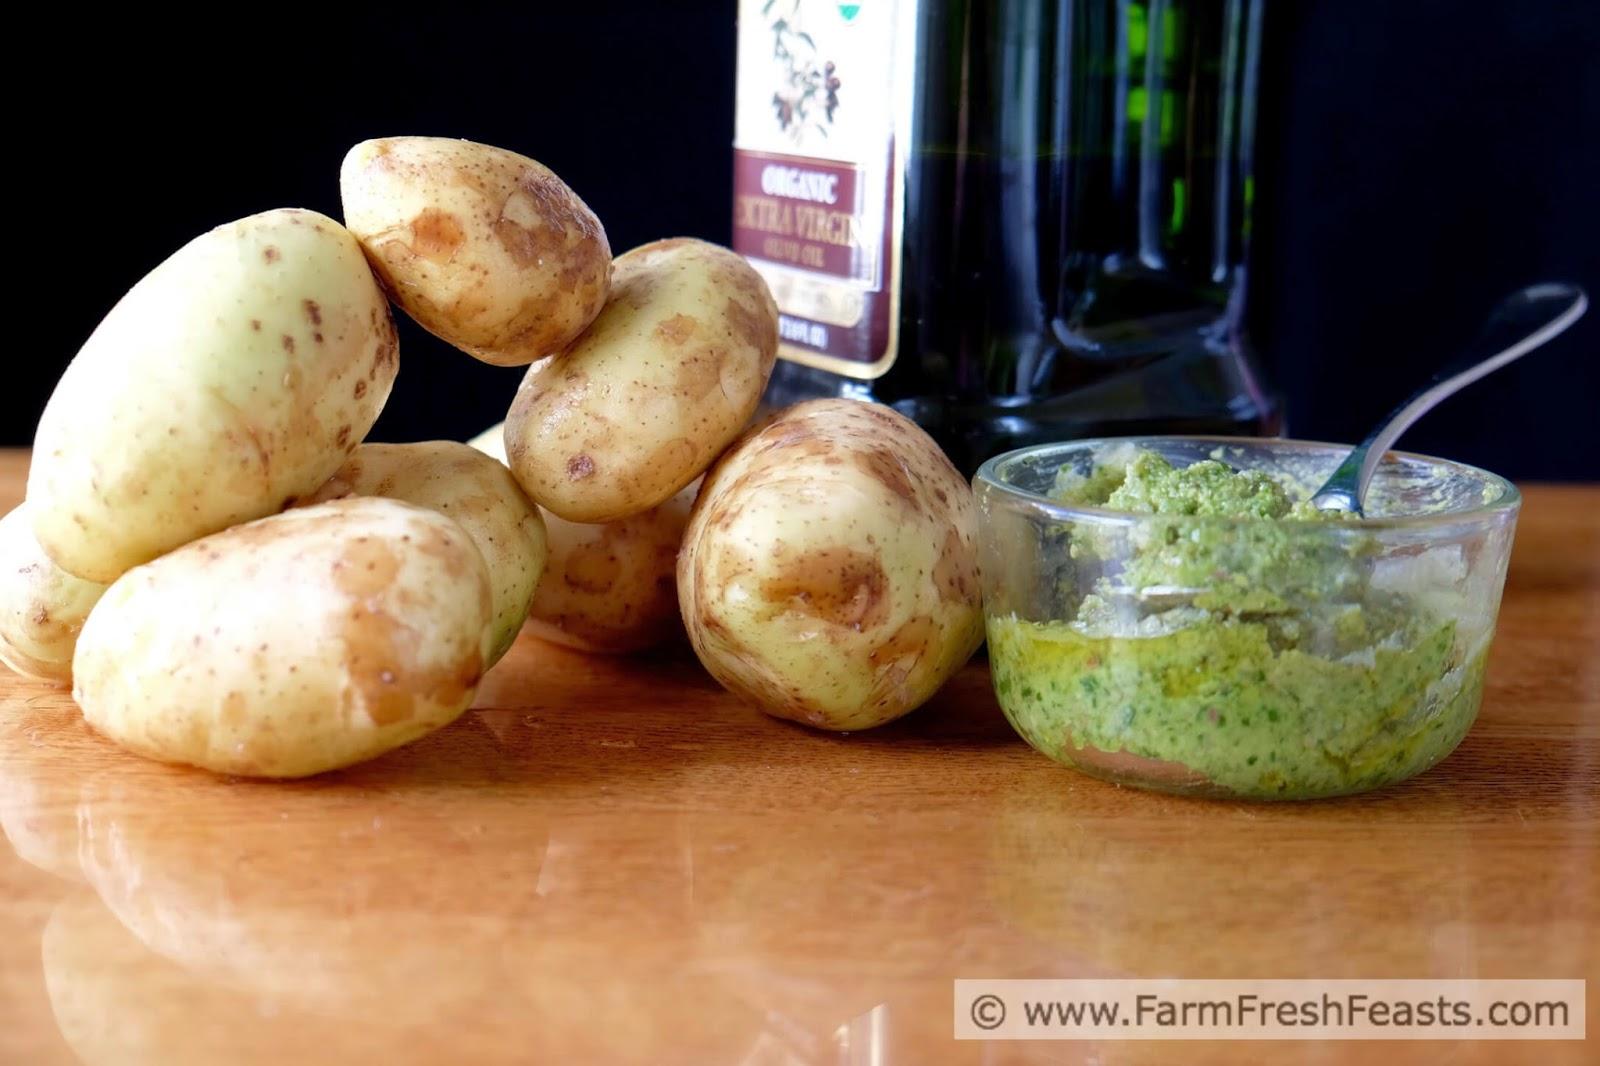 Grilled Garlic Scape Pesto Smashed Potatoes www.farmfreshfeasts.com